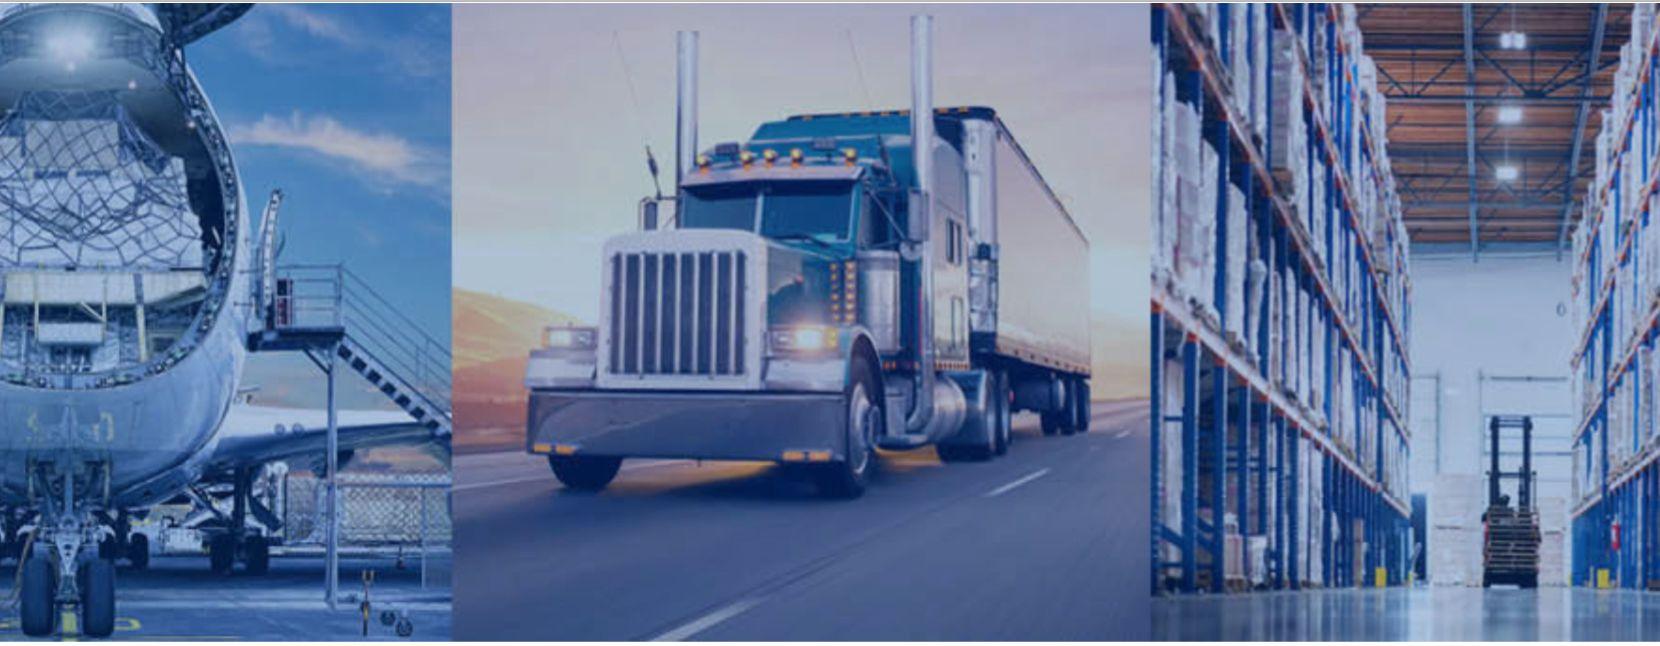 DSV International is a global logistics and transportation.